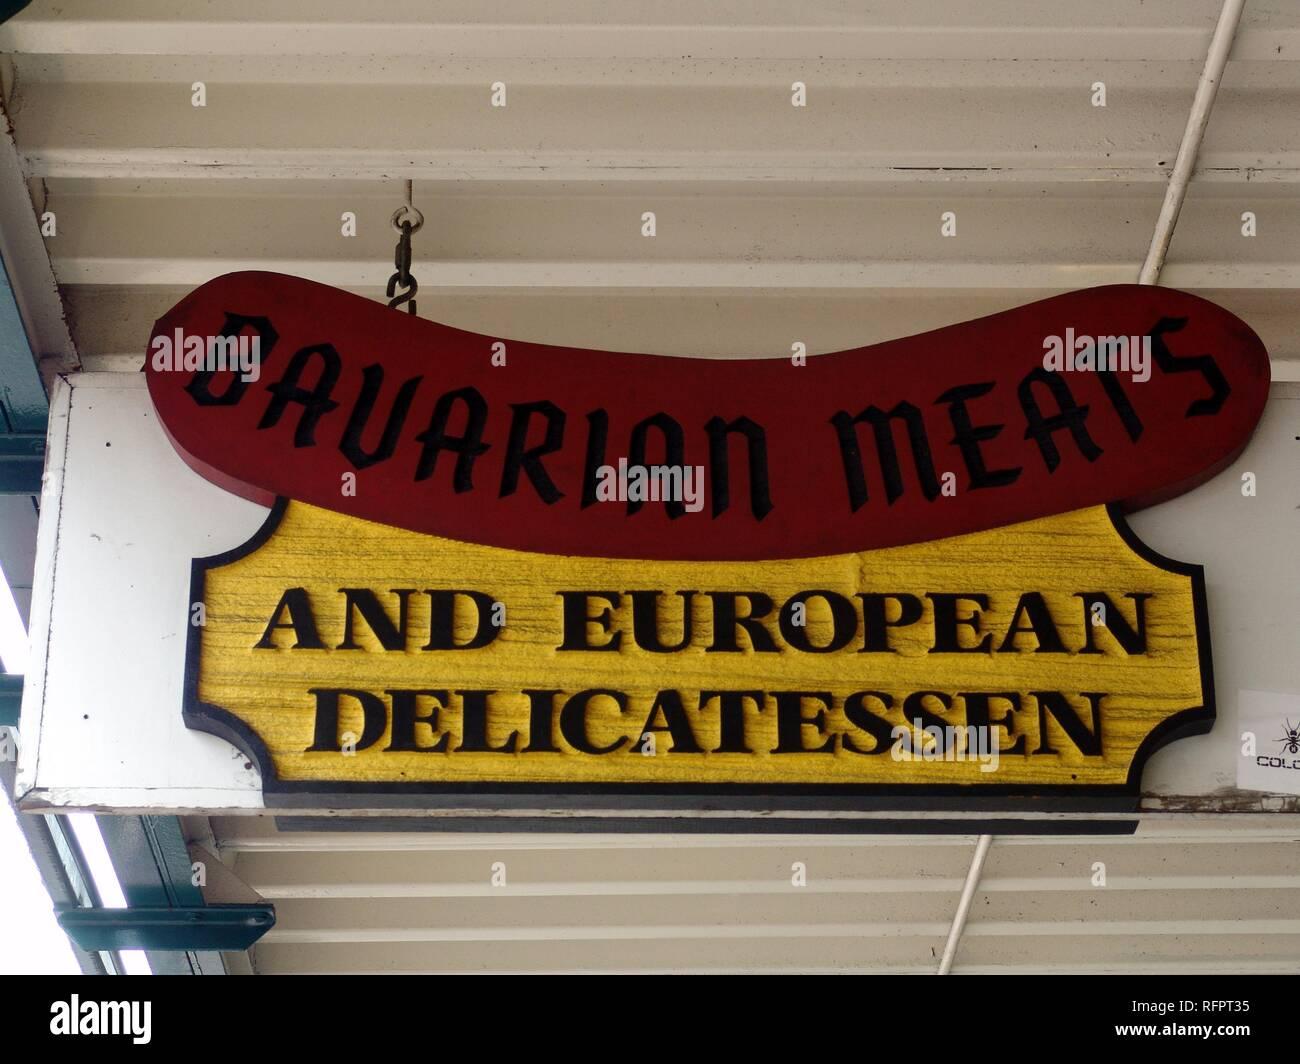 USA, United States of America : Delicatessen shop. Stock Photo